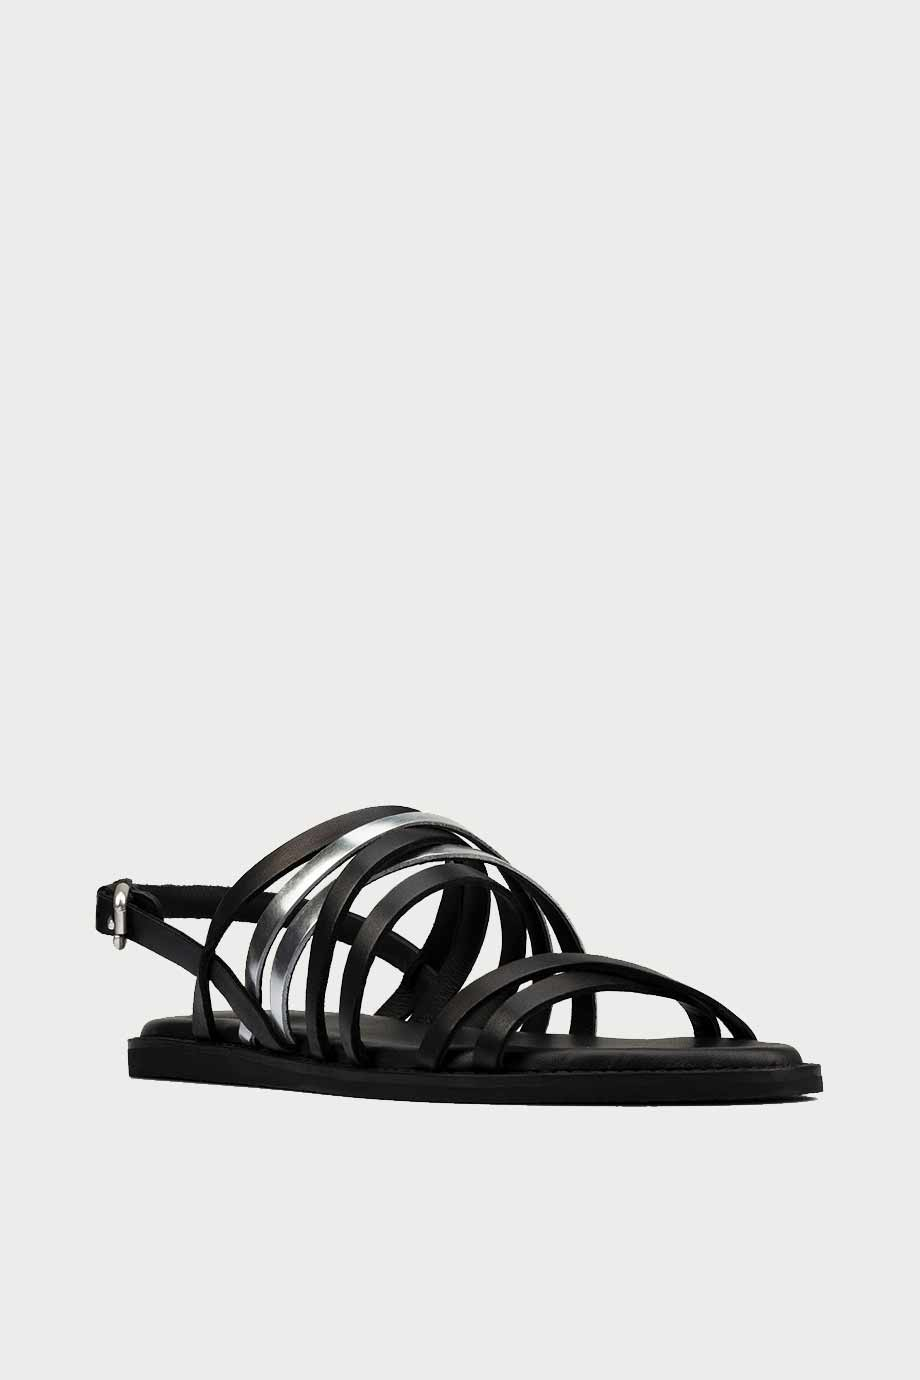 spiridoula metheniti shoes xalkida p Karsea Ankle clarks black combi lea 2